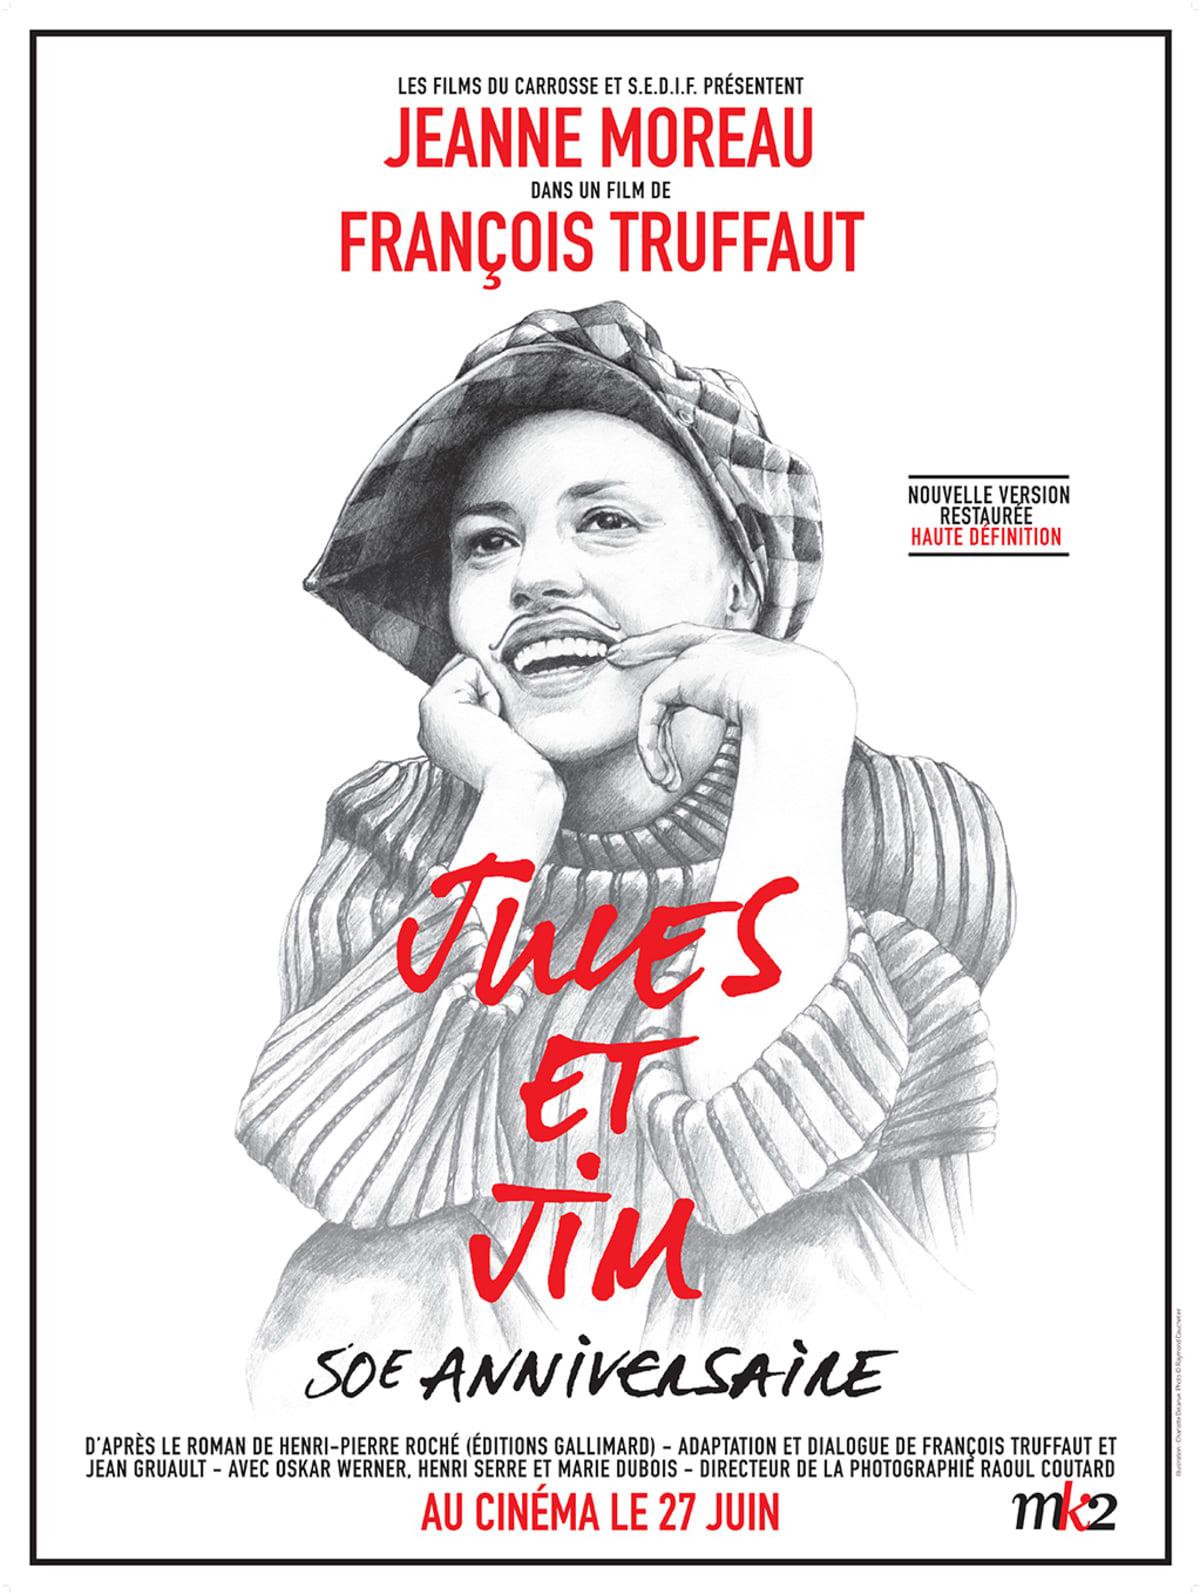 Jeanne Moreau Jules&Jim -julisteessa.